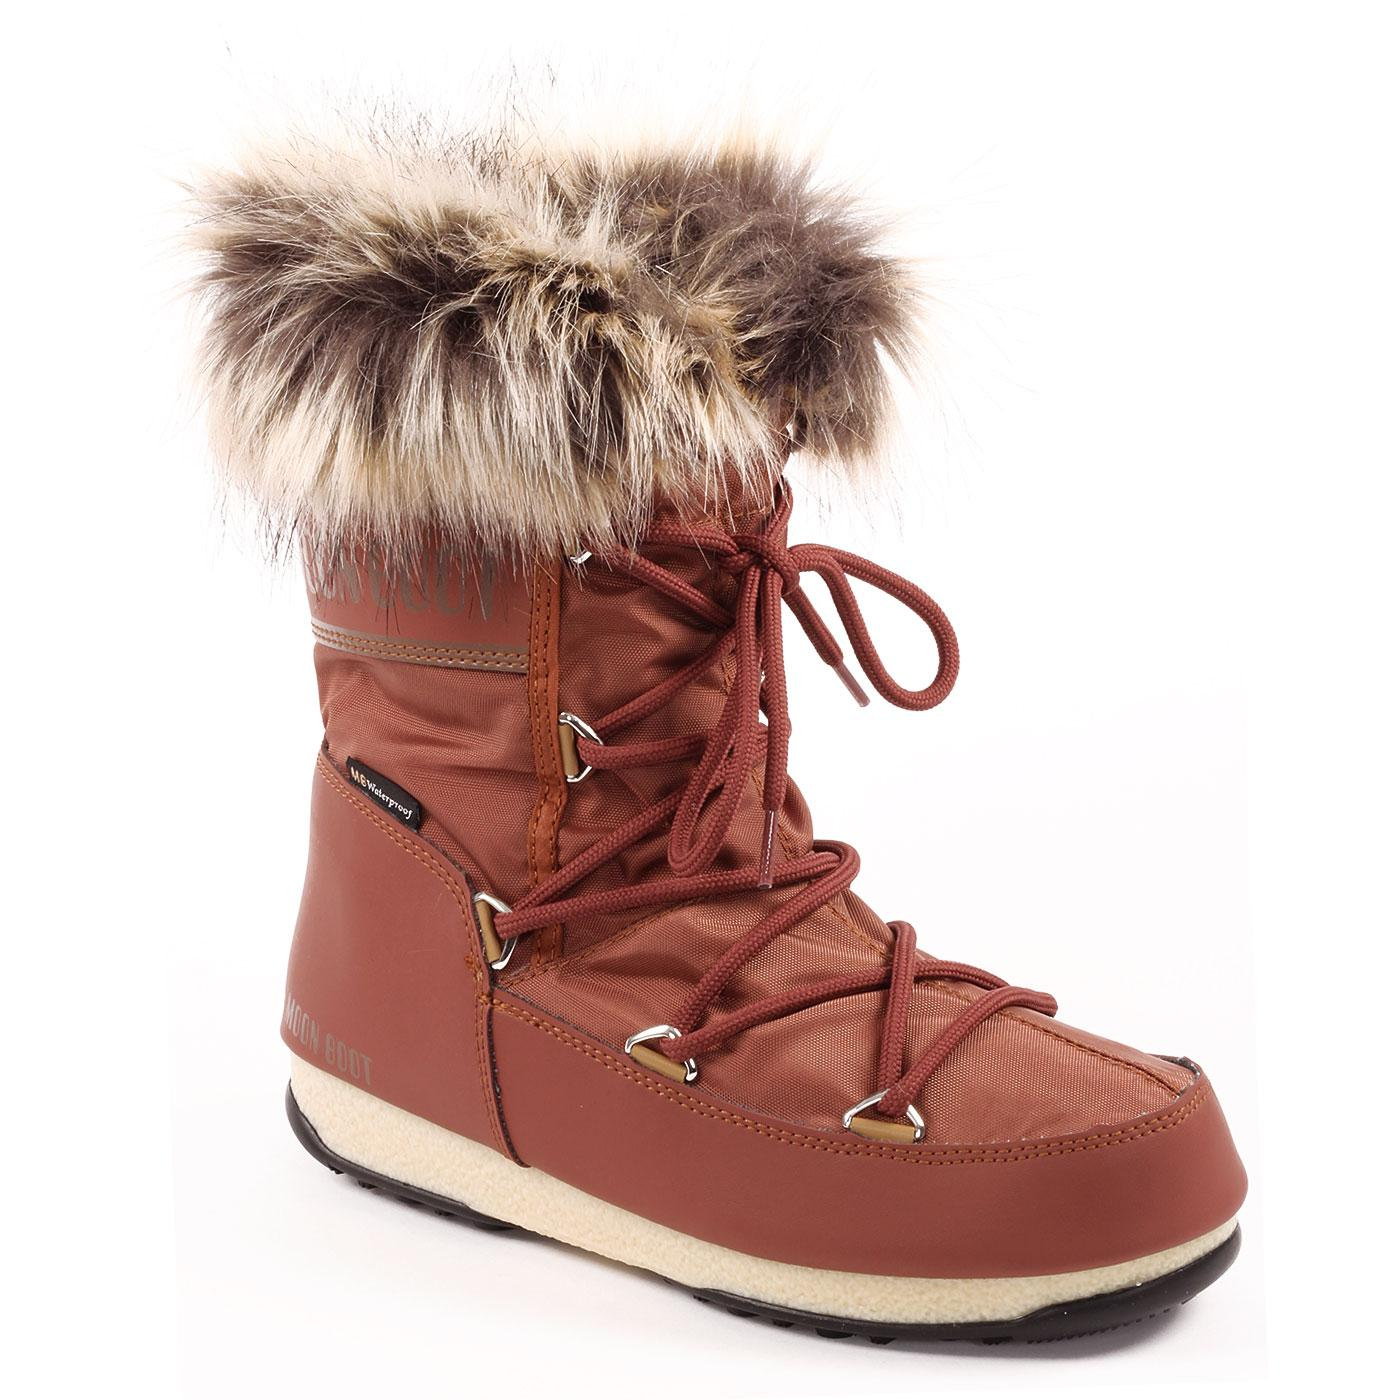 MOON BOOT Monaco Low Retro 70s Winter Boots R